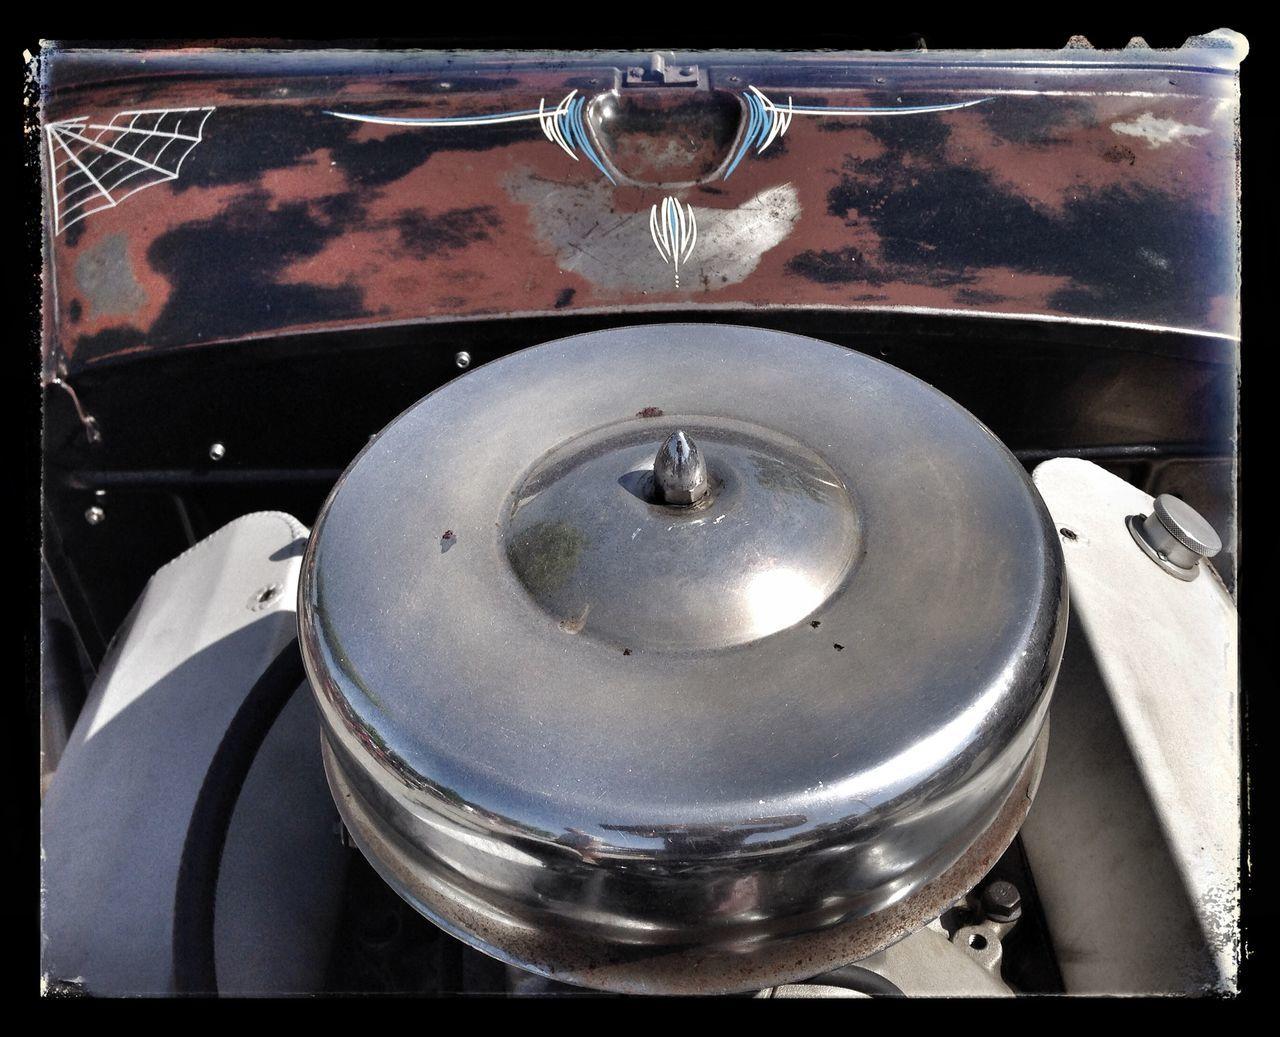 American Classics Cars Historic Cars Oldtimer Oldtimertreffen Rust Rusty US Cars